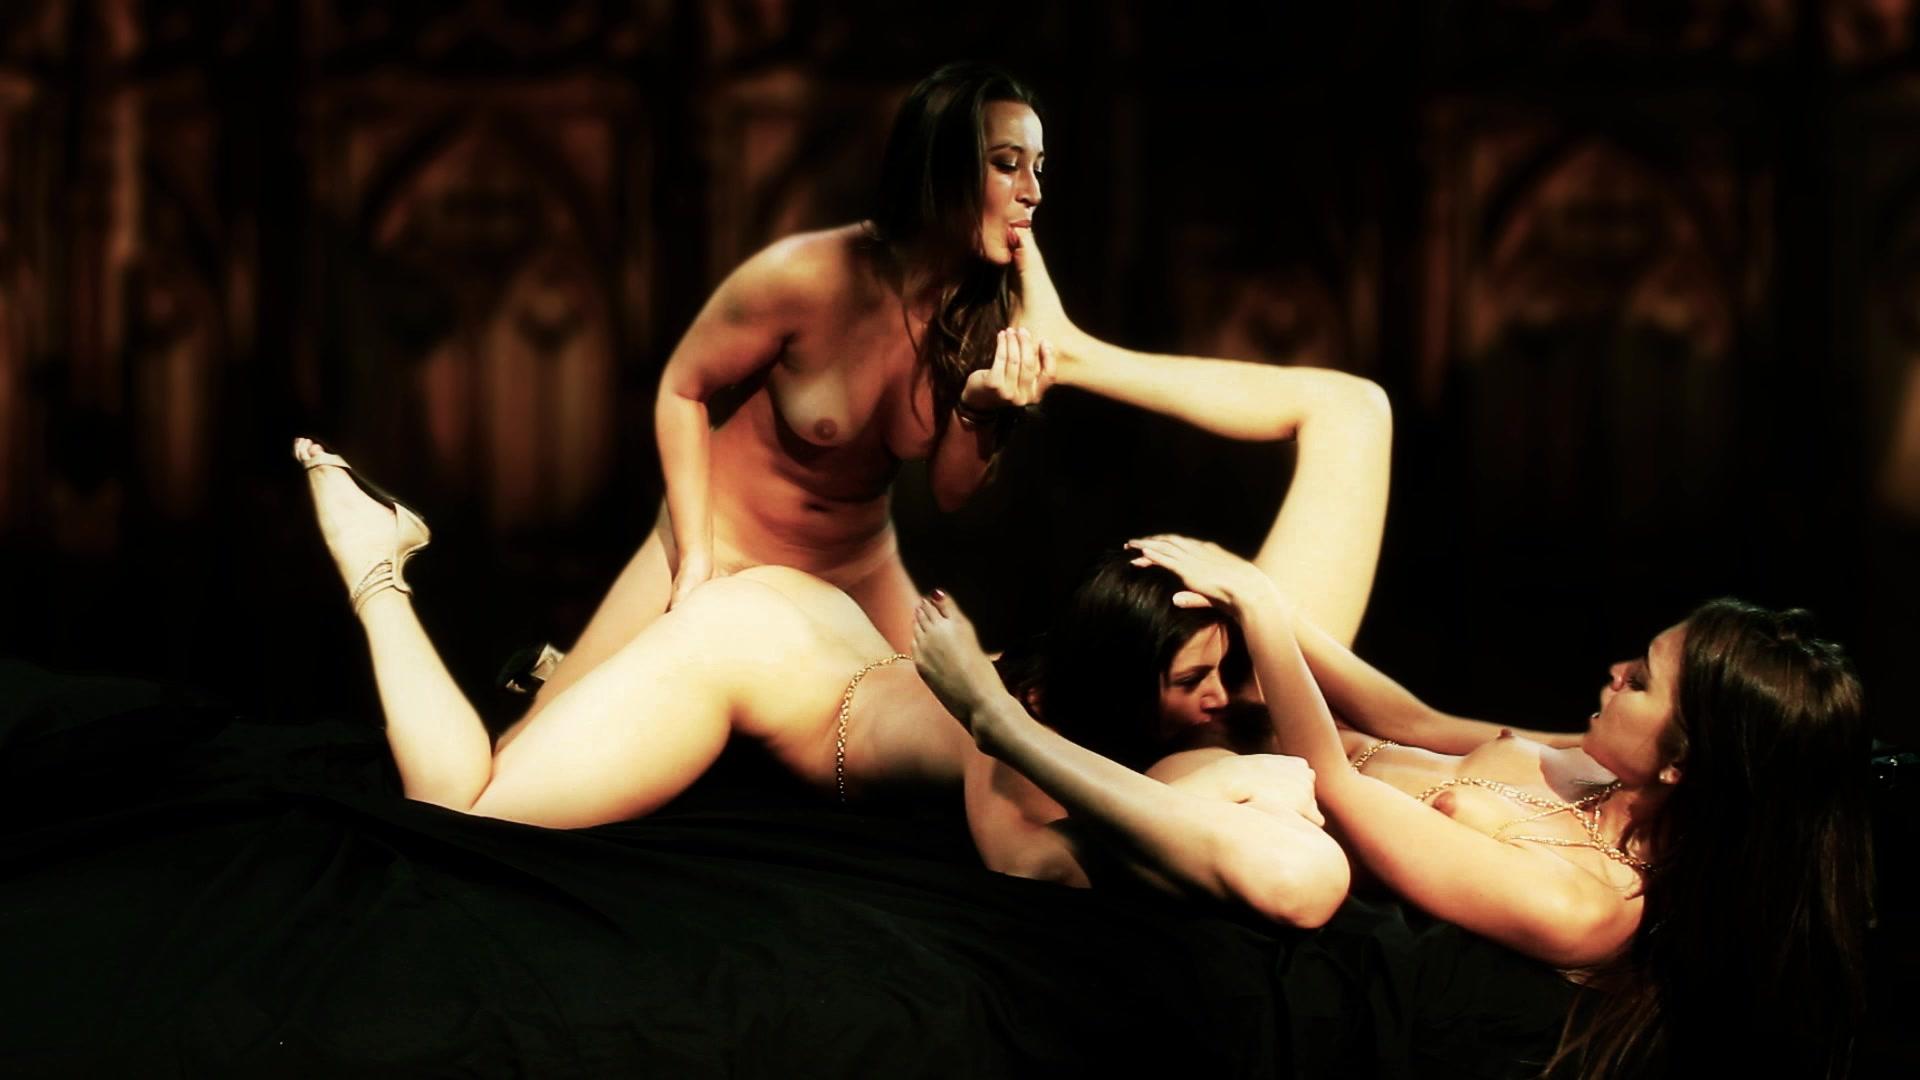 lustful lesbian dani daniels riley reid